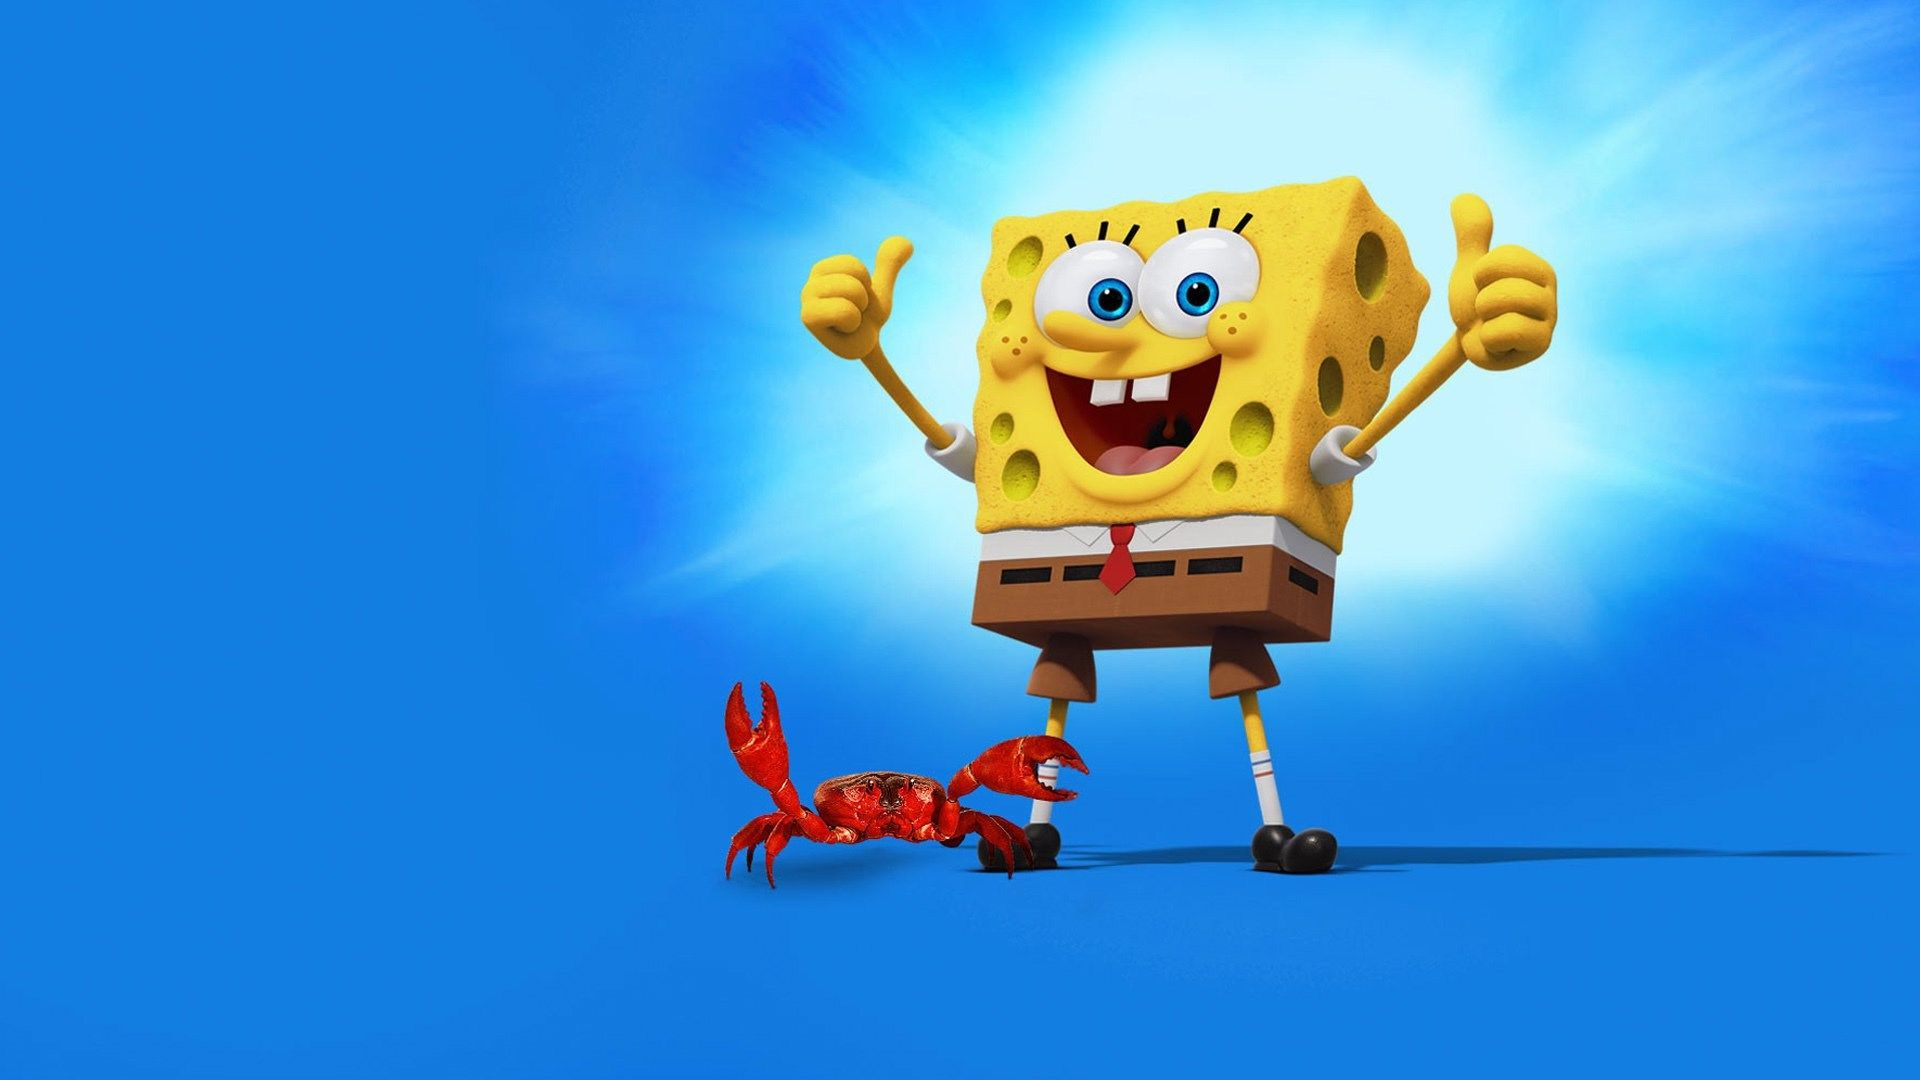 1920x1080 Windows Wallpaper The Spongebob Movie Sponge Out Of